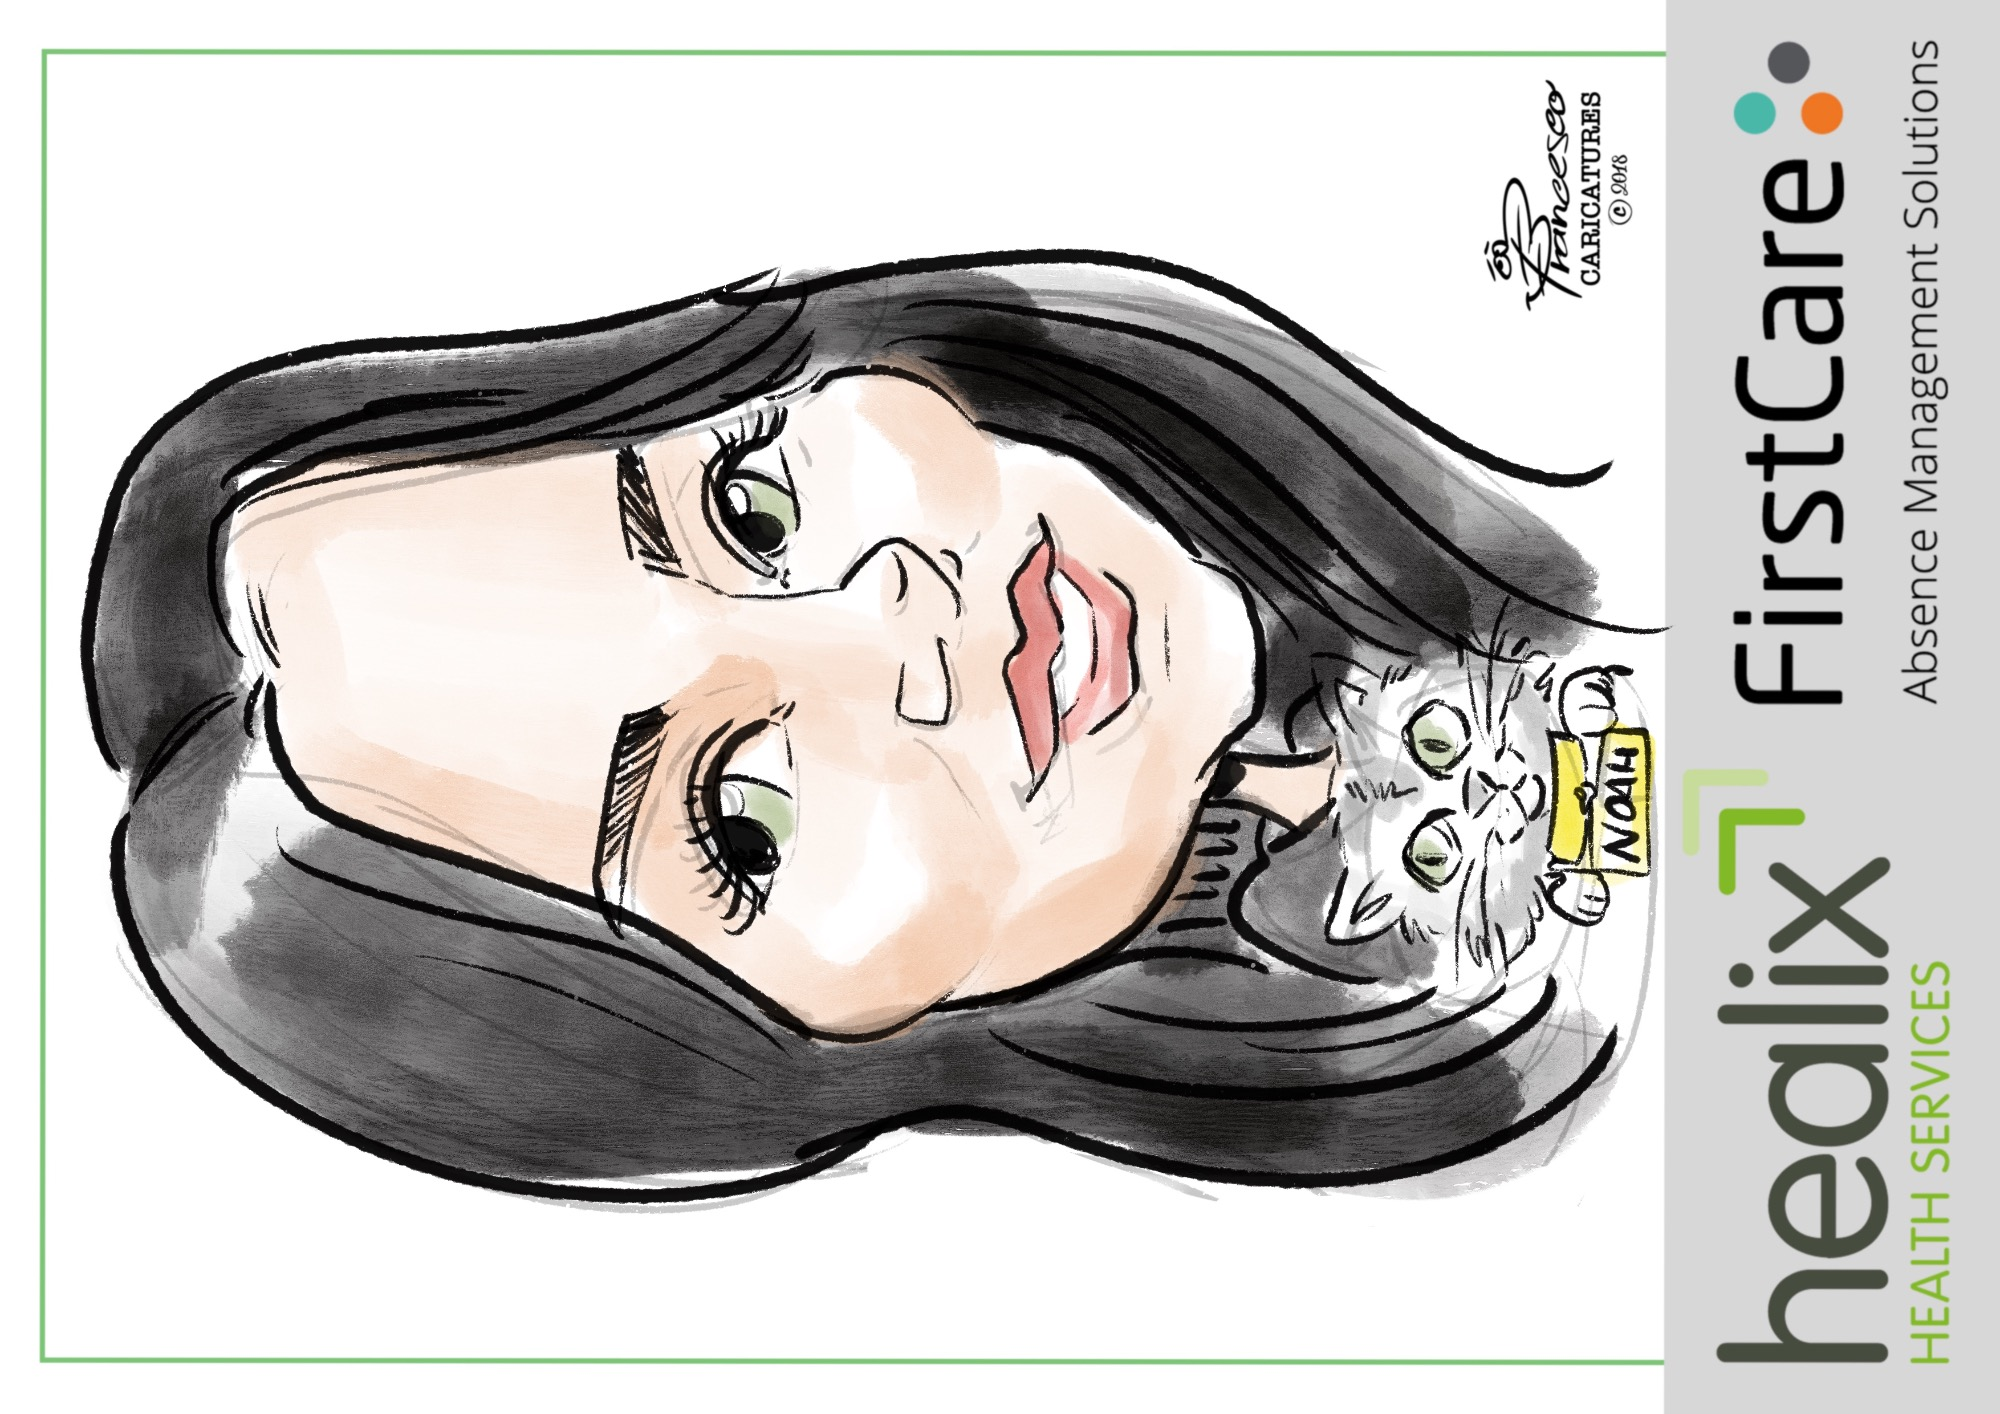 Promo Francesco Digital Caricatures  London